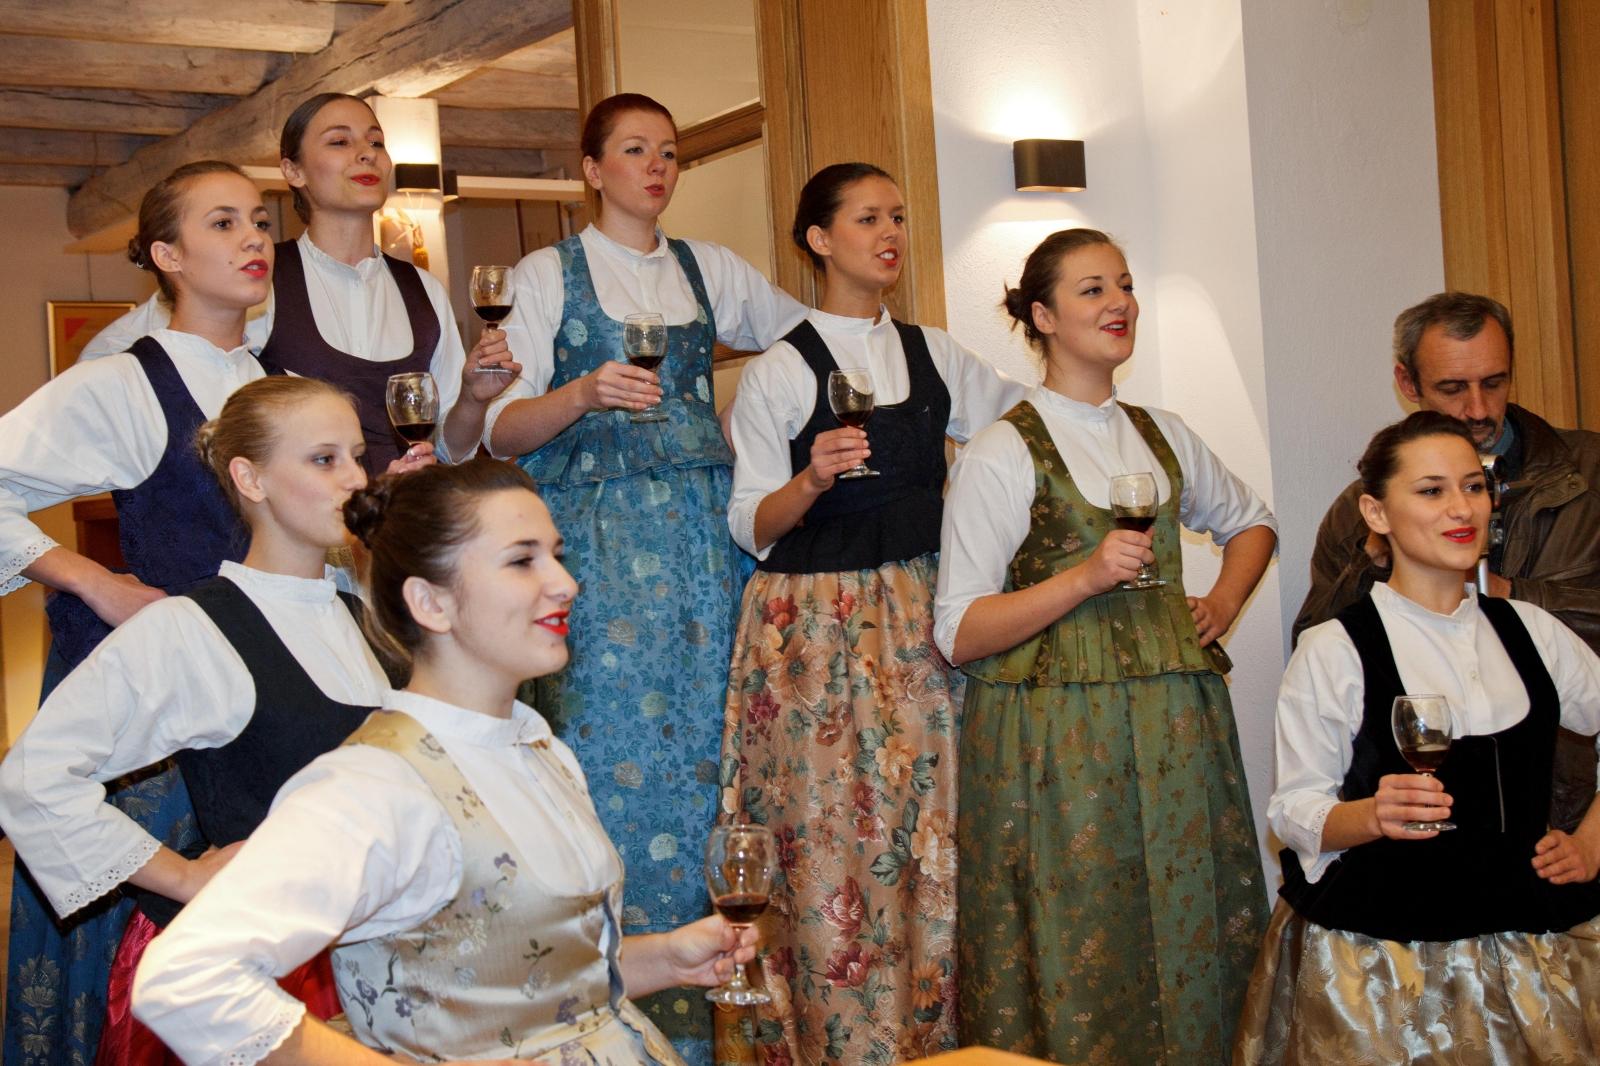 Slavonija i Baranja: Feravino i ekskluzivni etno program